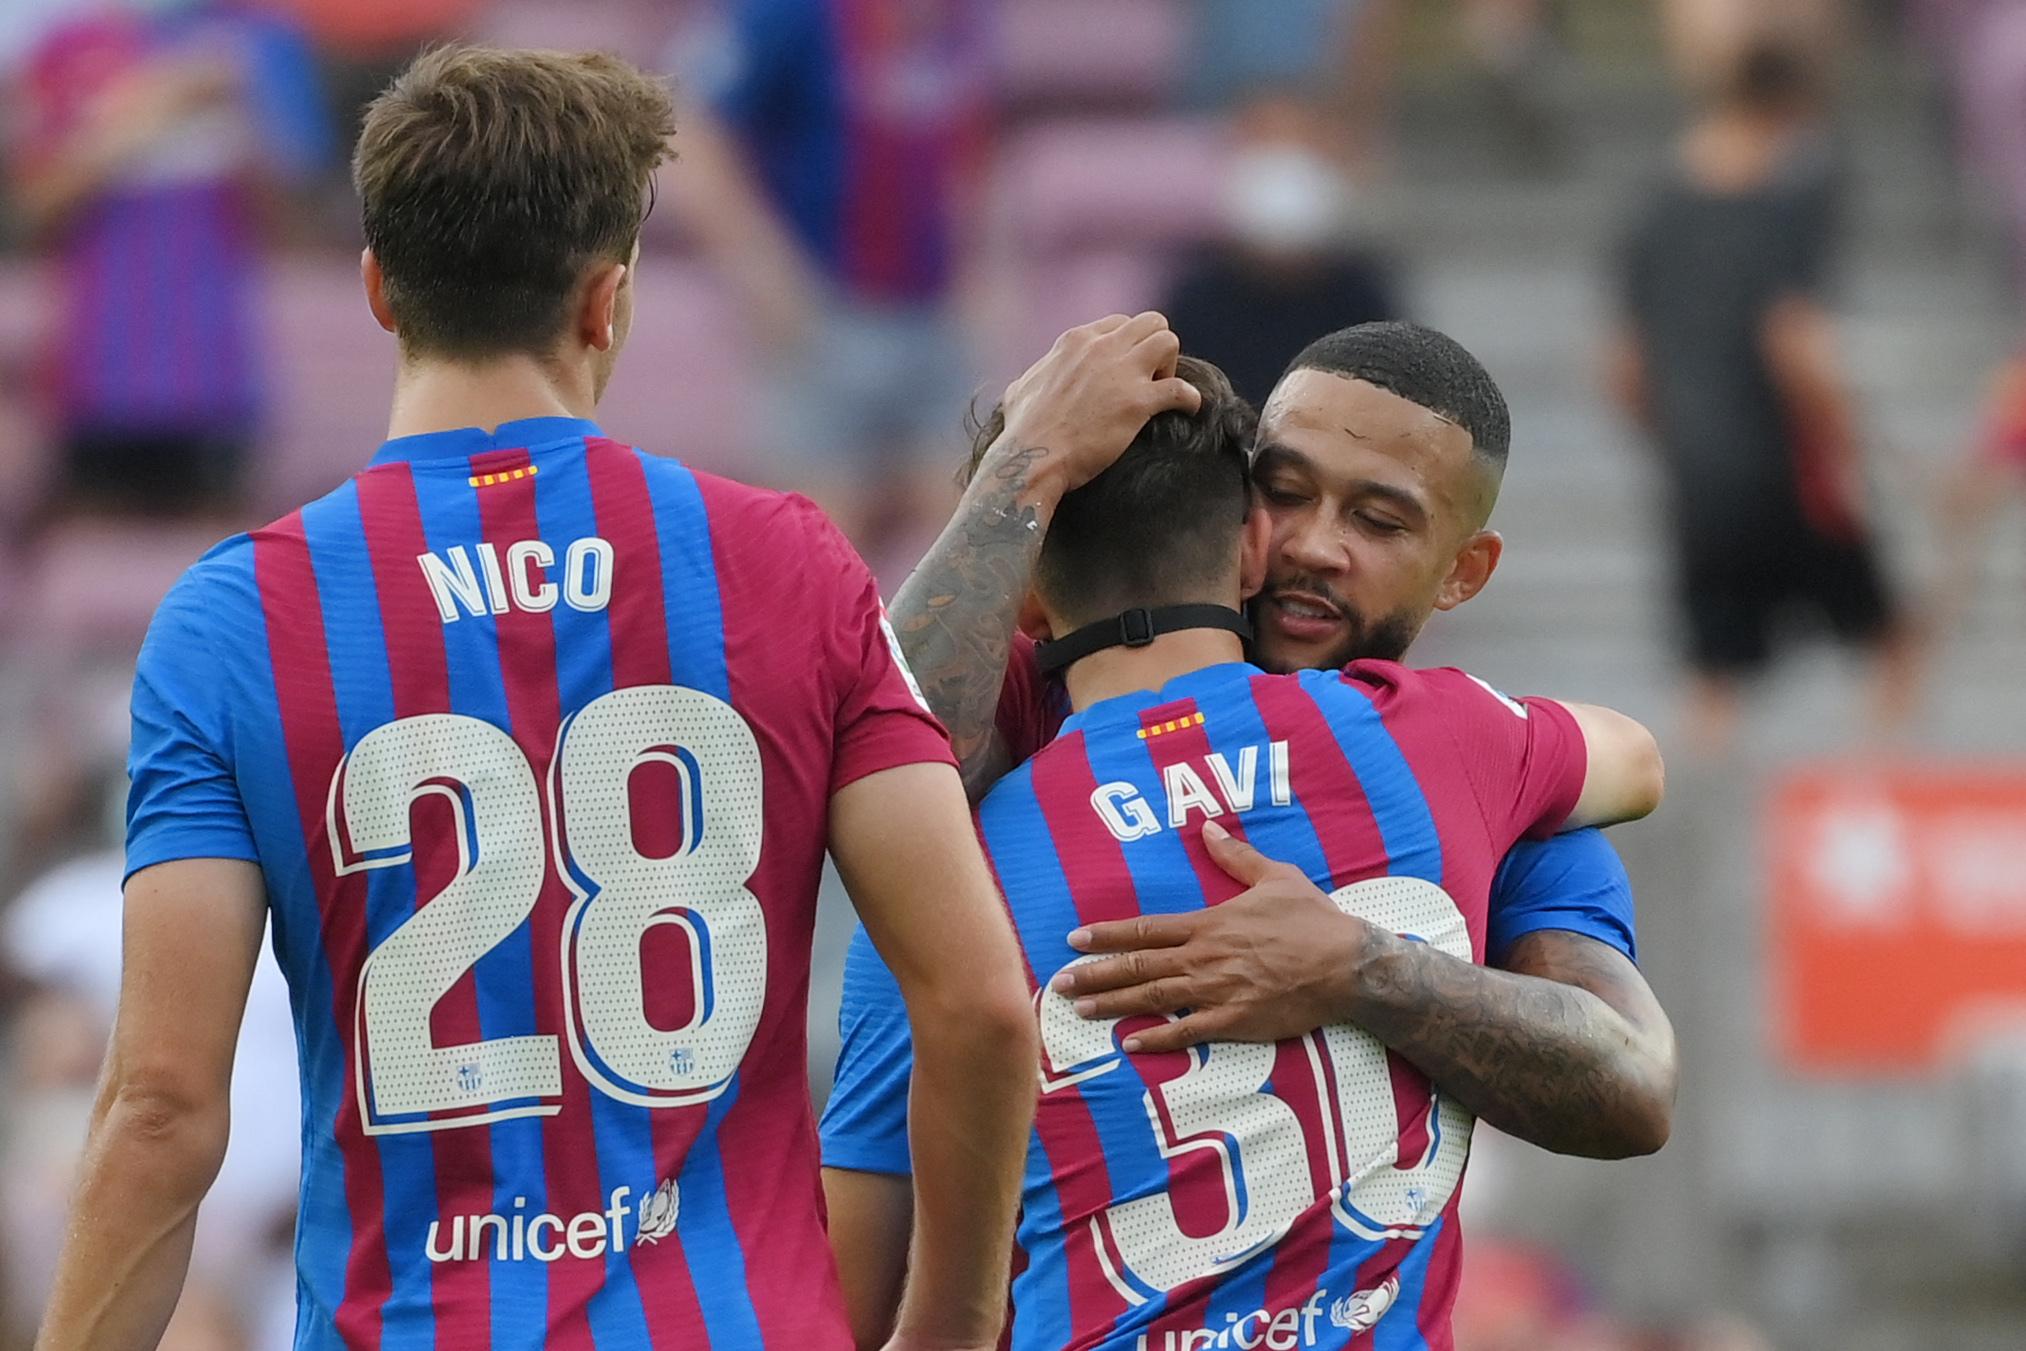 Memphis se abraza a Gavi, ante Nico, en el Camp Nou.